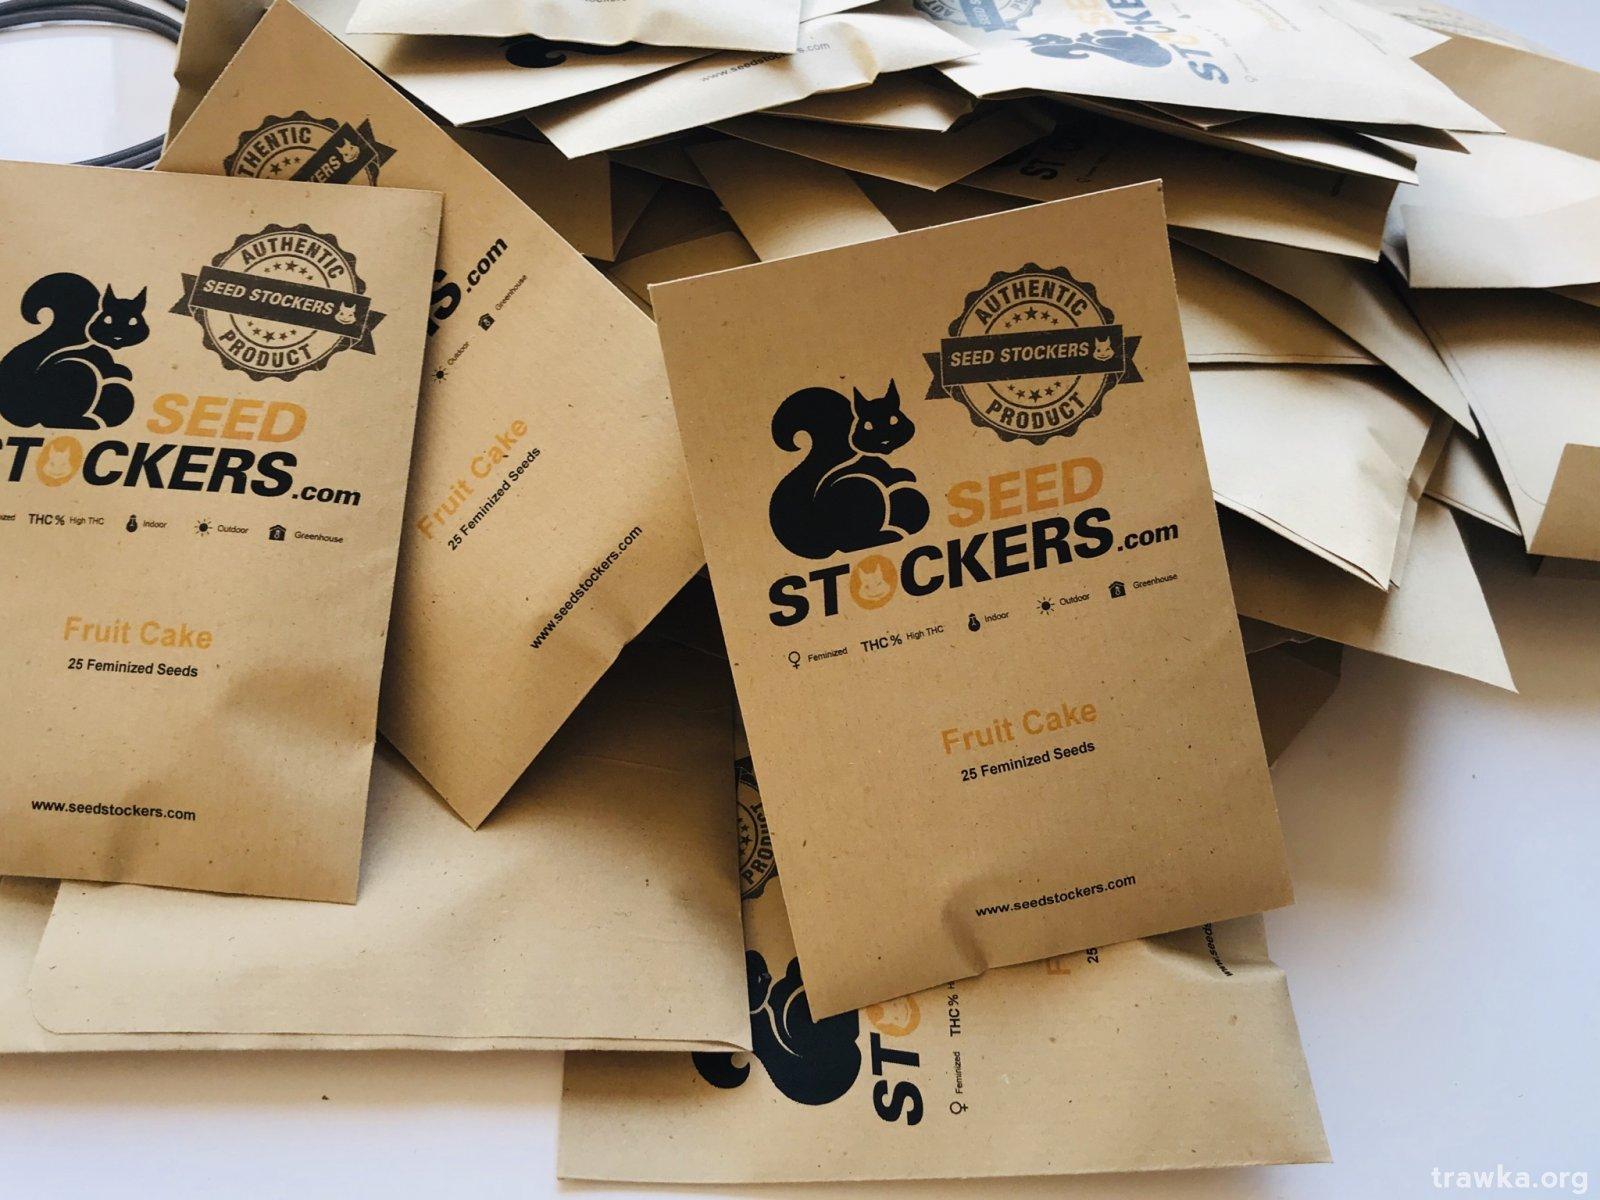 seedstockers.com paczki nasion